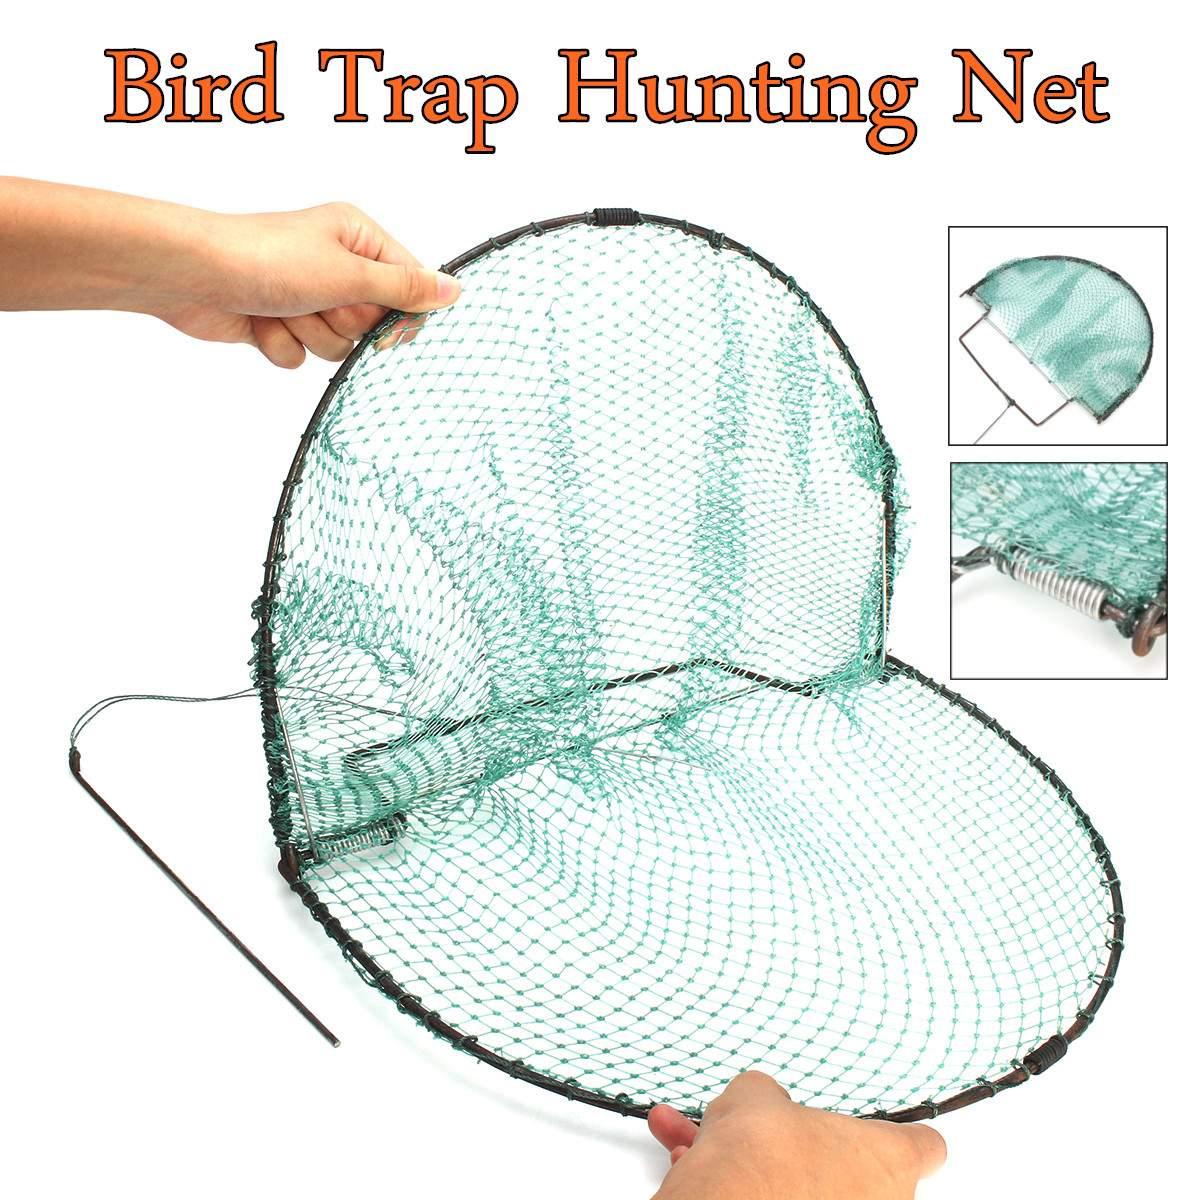 Bird Net Effective Humane Live Trap Hunting Sensitive Quail Humane Trapping Hunting Garden Supplies Pest Control 49X30cm